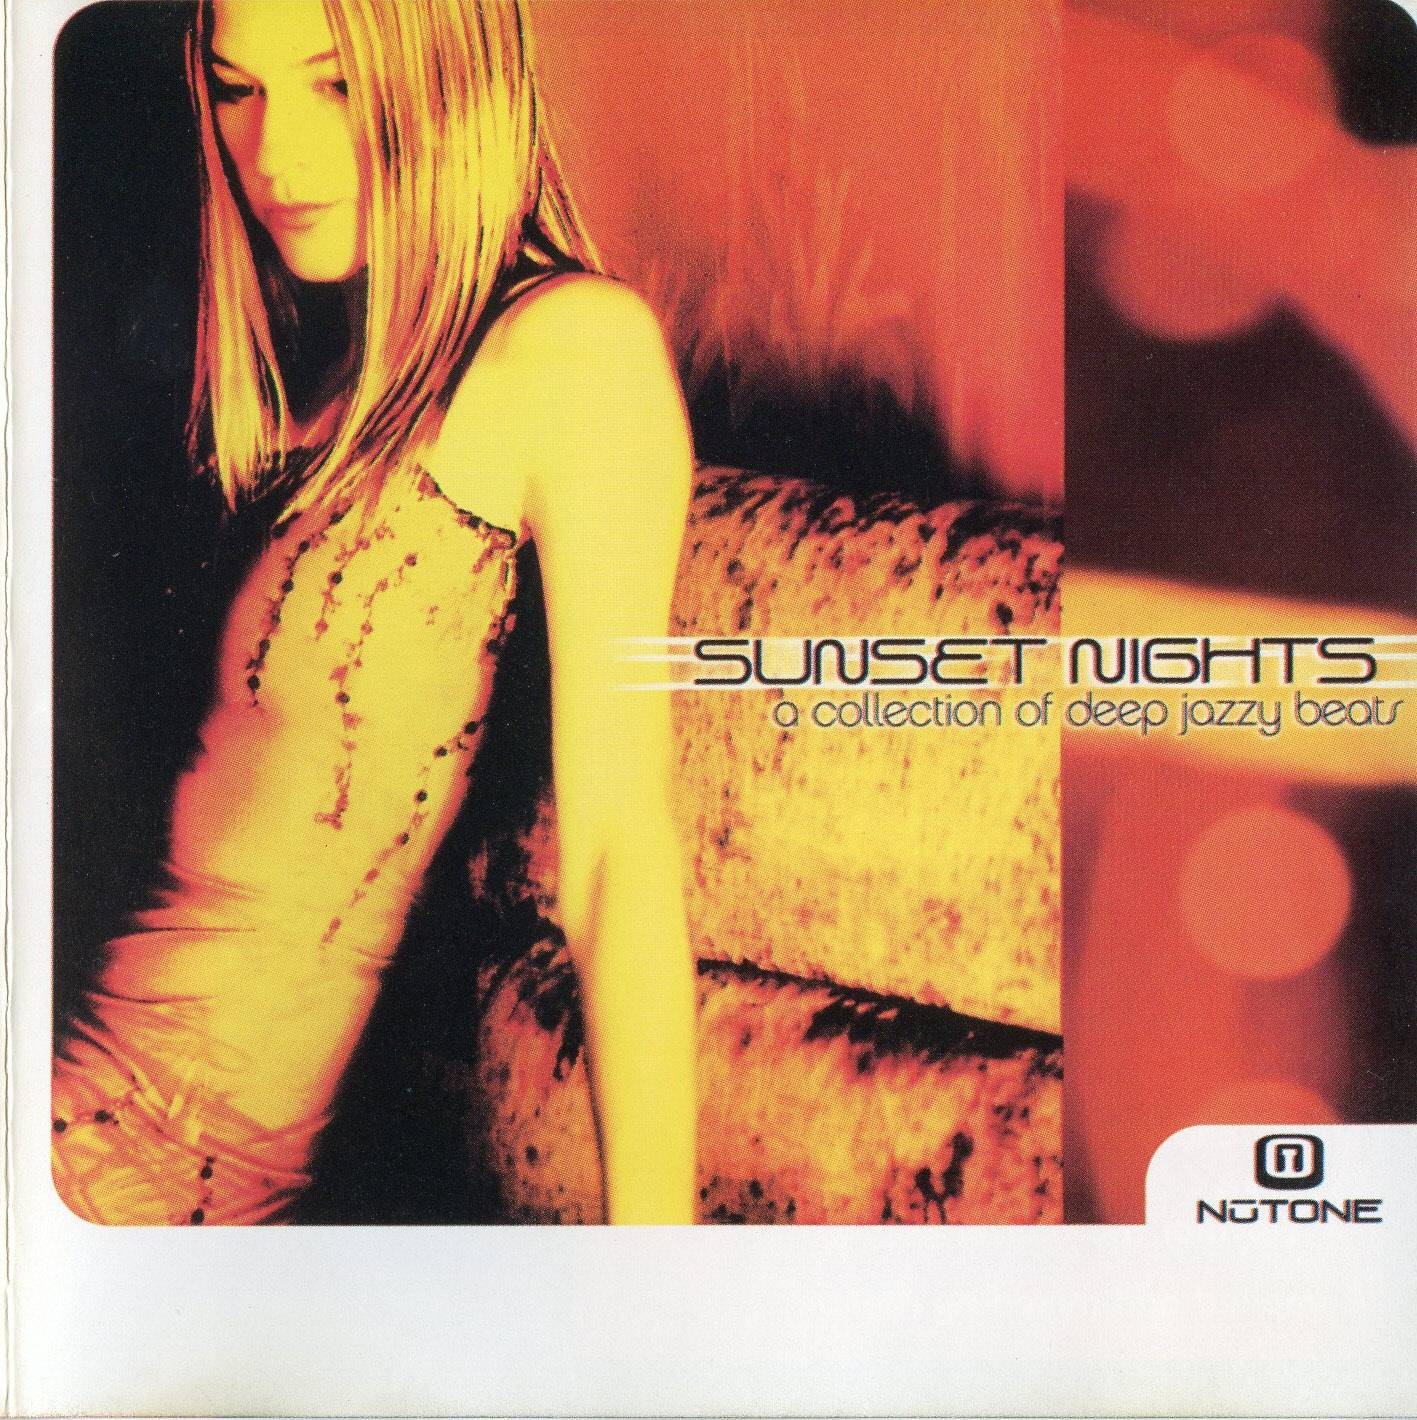 VA - Sunset Nights: A Collection Of Deep Jazzy Beats (2003)